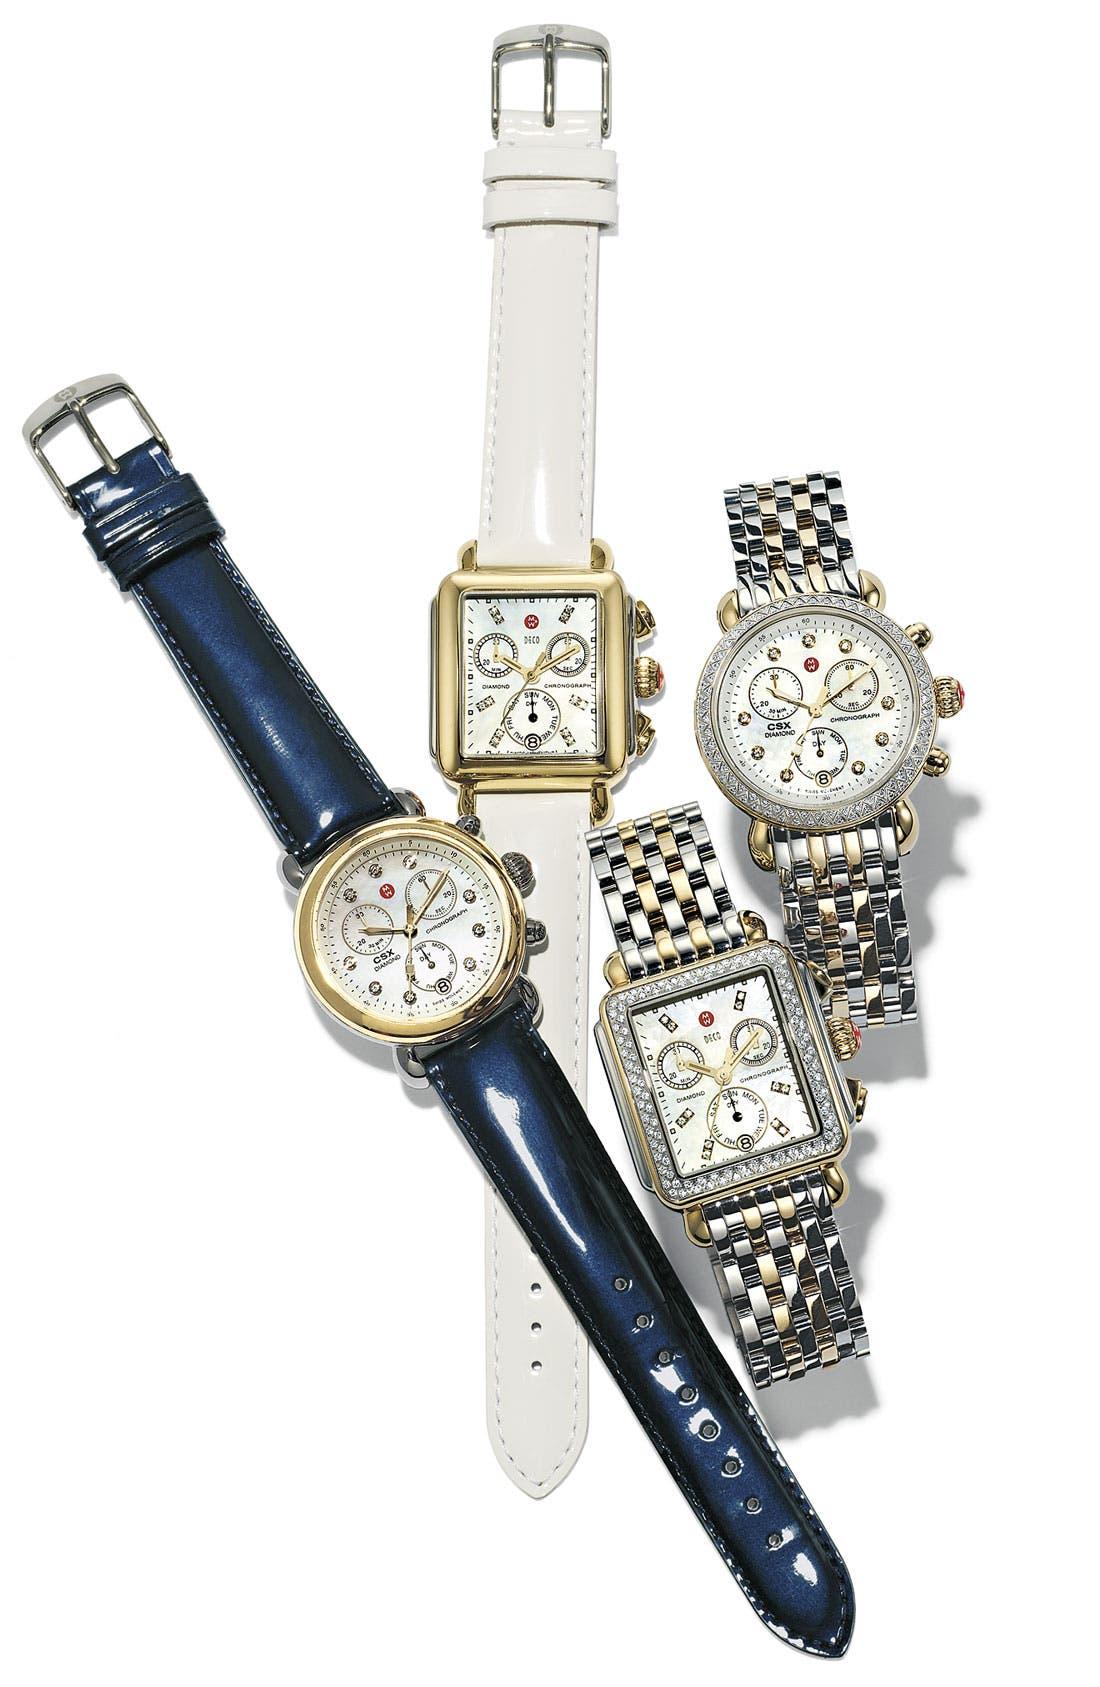 Alternate Image 1 Selected - MICHELE 'CSX-36 Diamond' Diamond Dial Two-Tone Watch Case & 18mm Bracelet